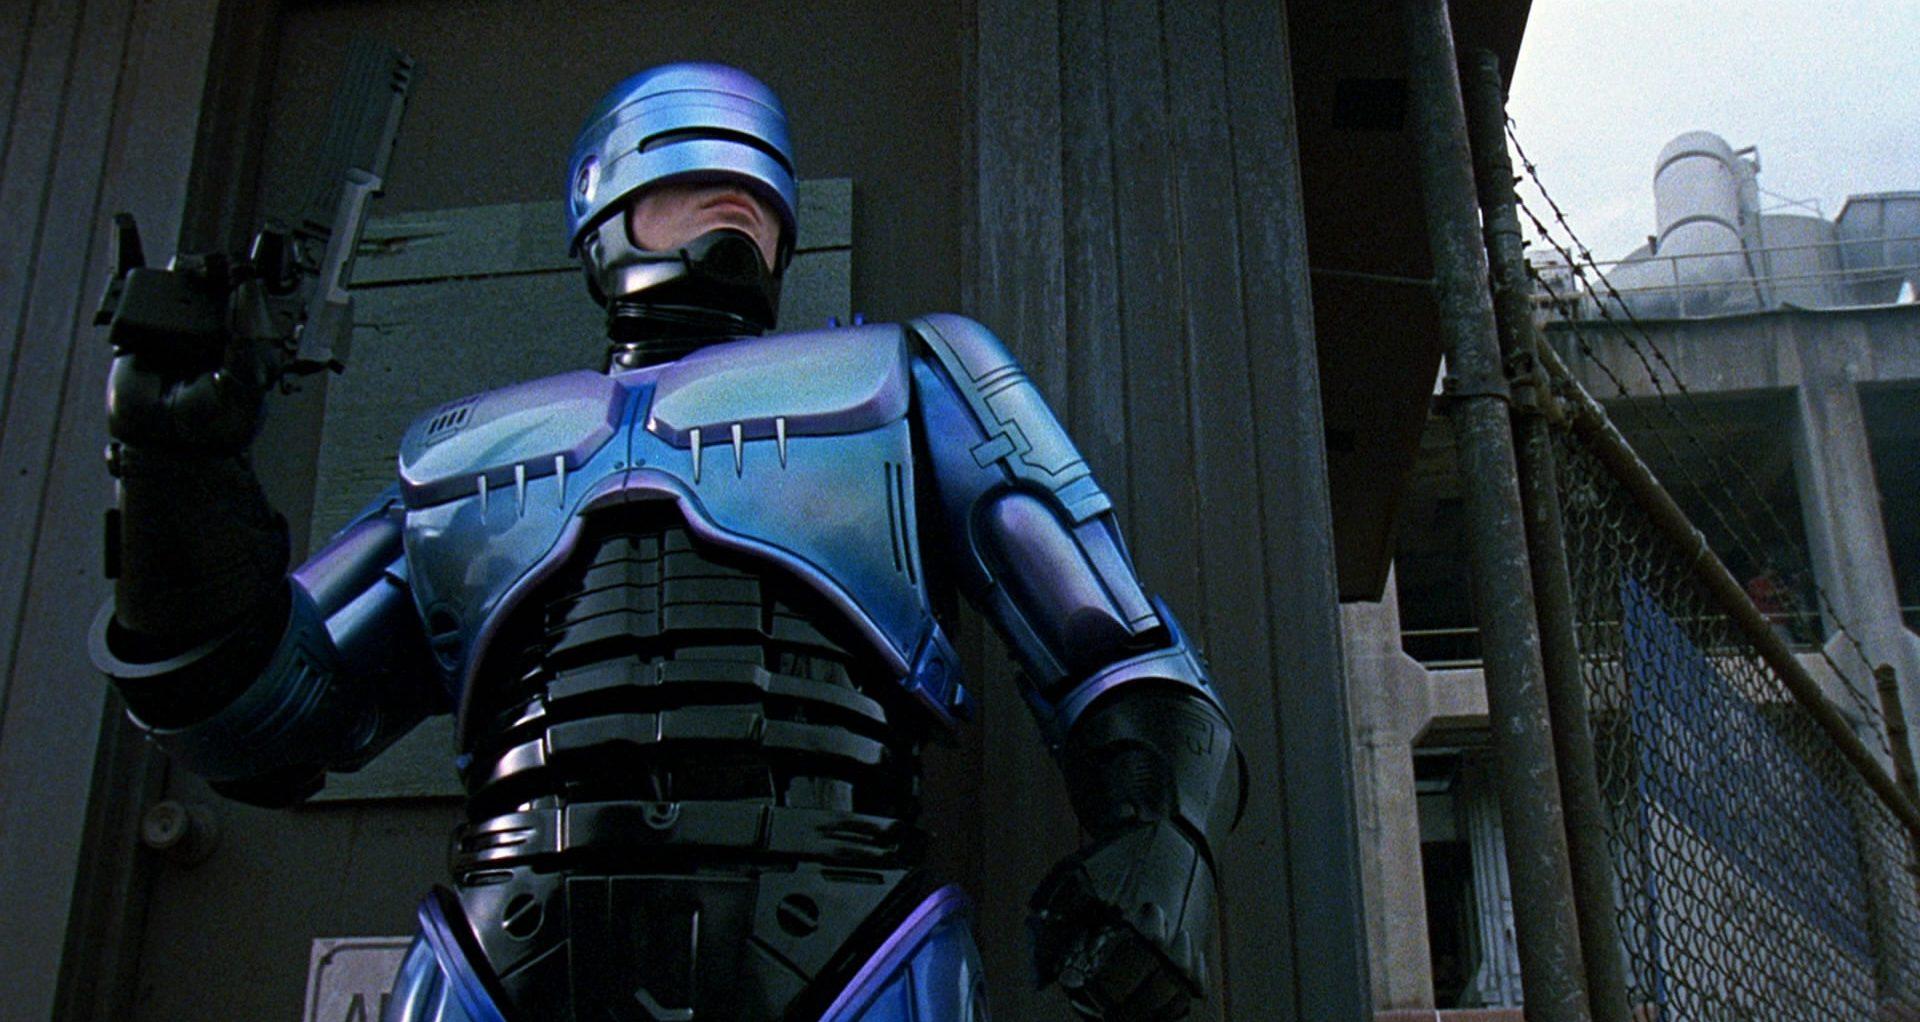 15a 1 e1609346462336 20 Futuristic Facts About RoboCop 2